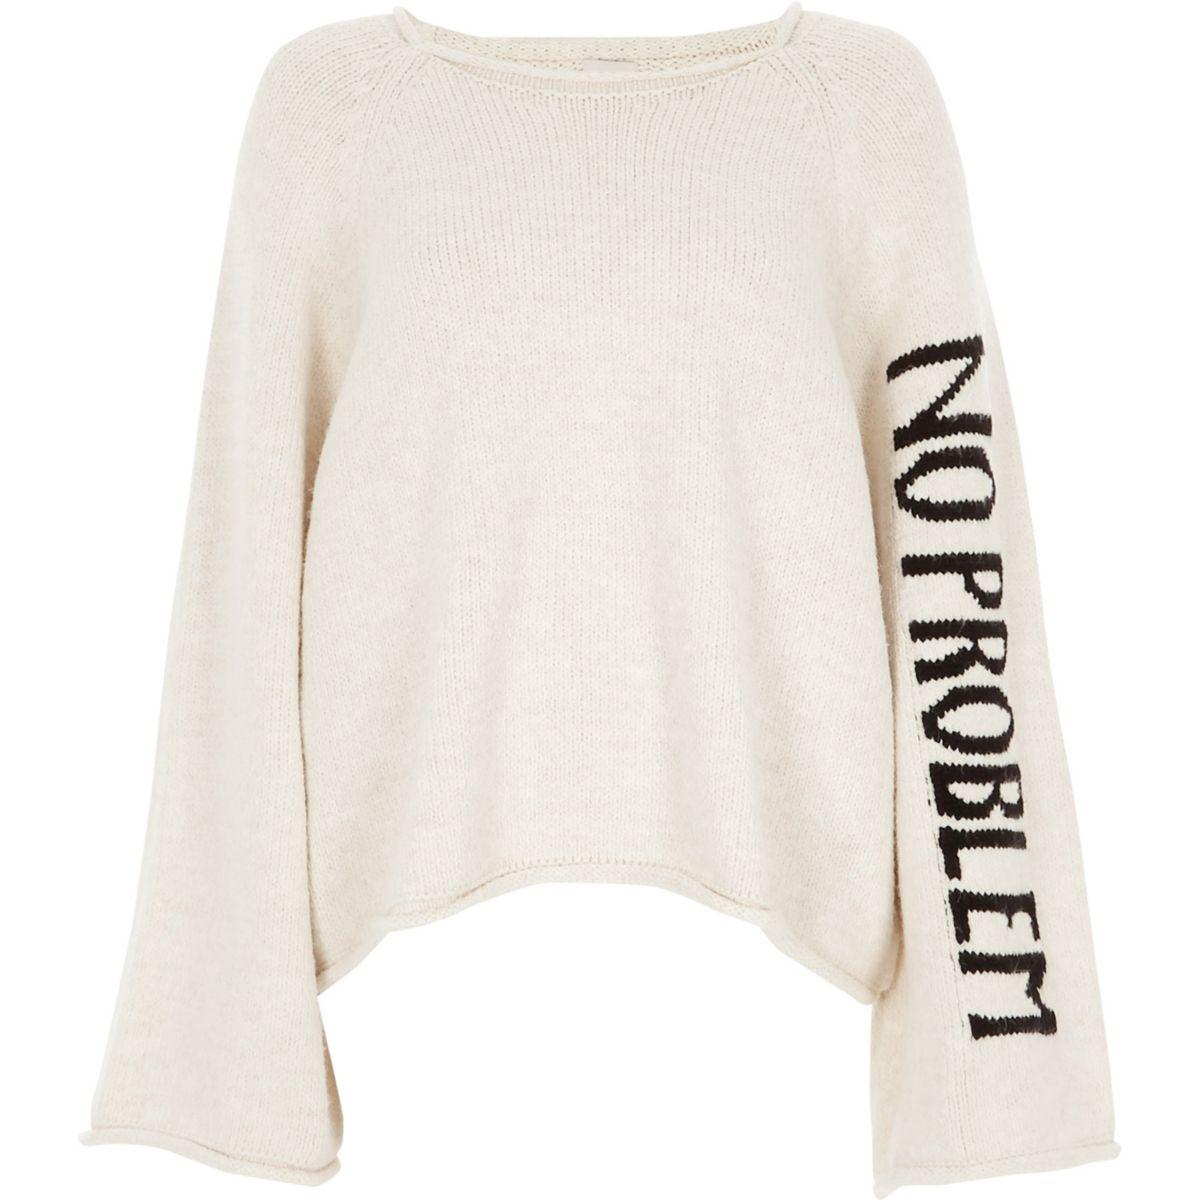 Cream wide sleeve 'no problem' jumper